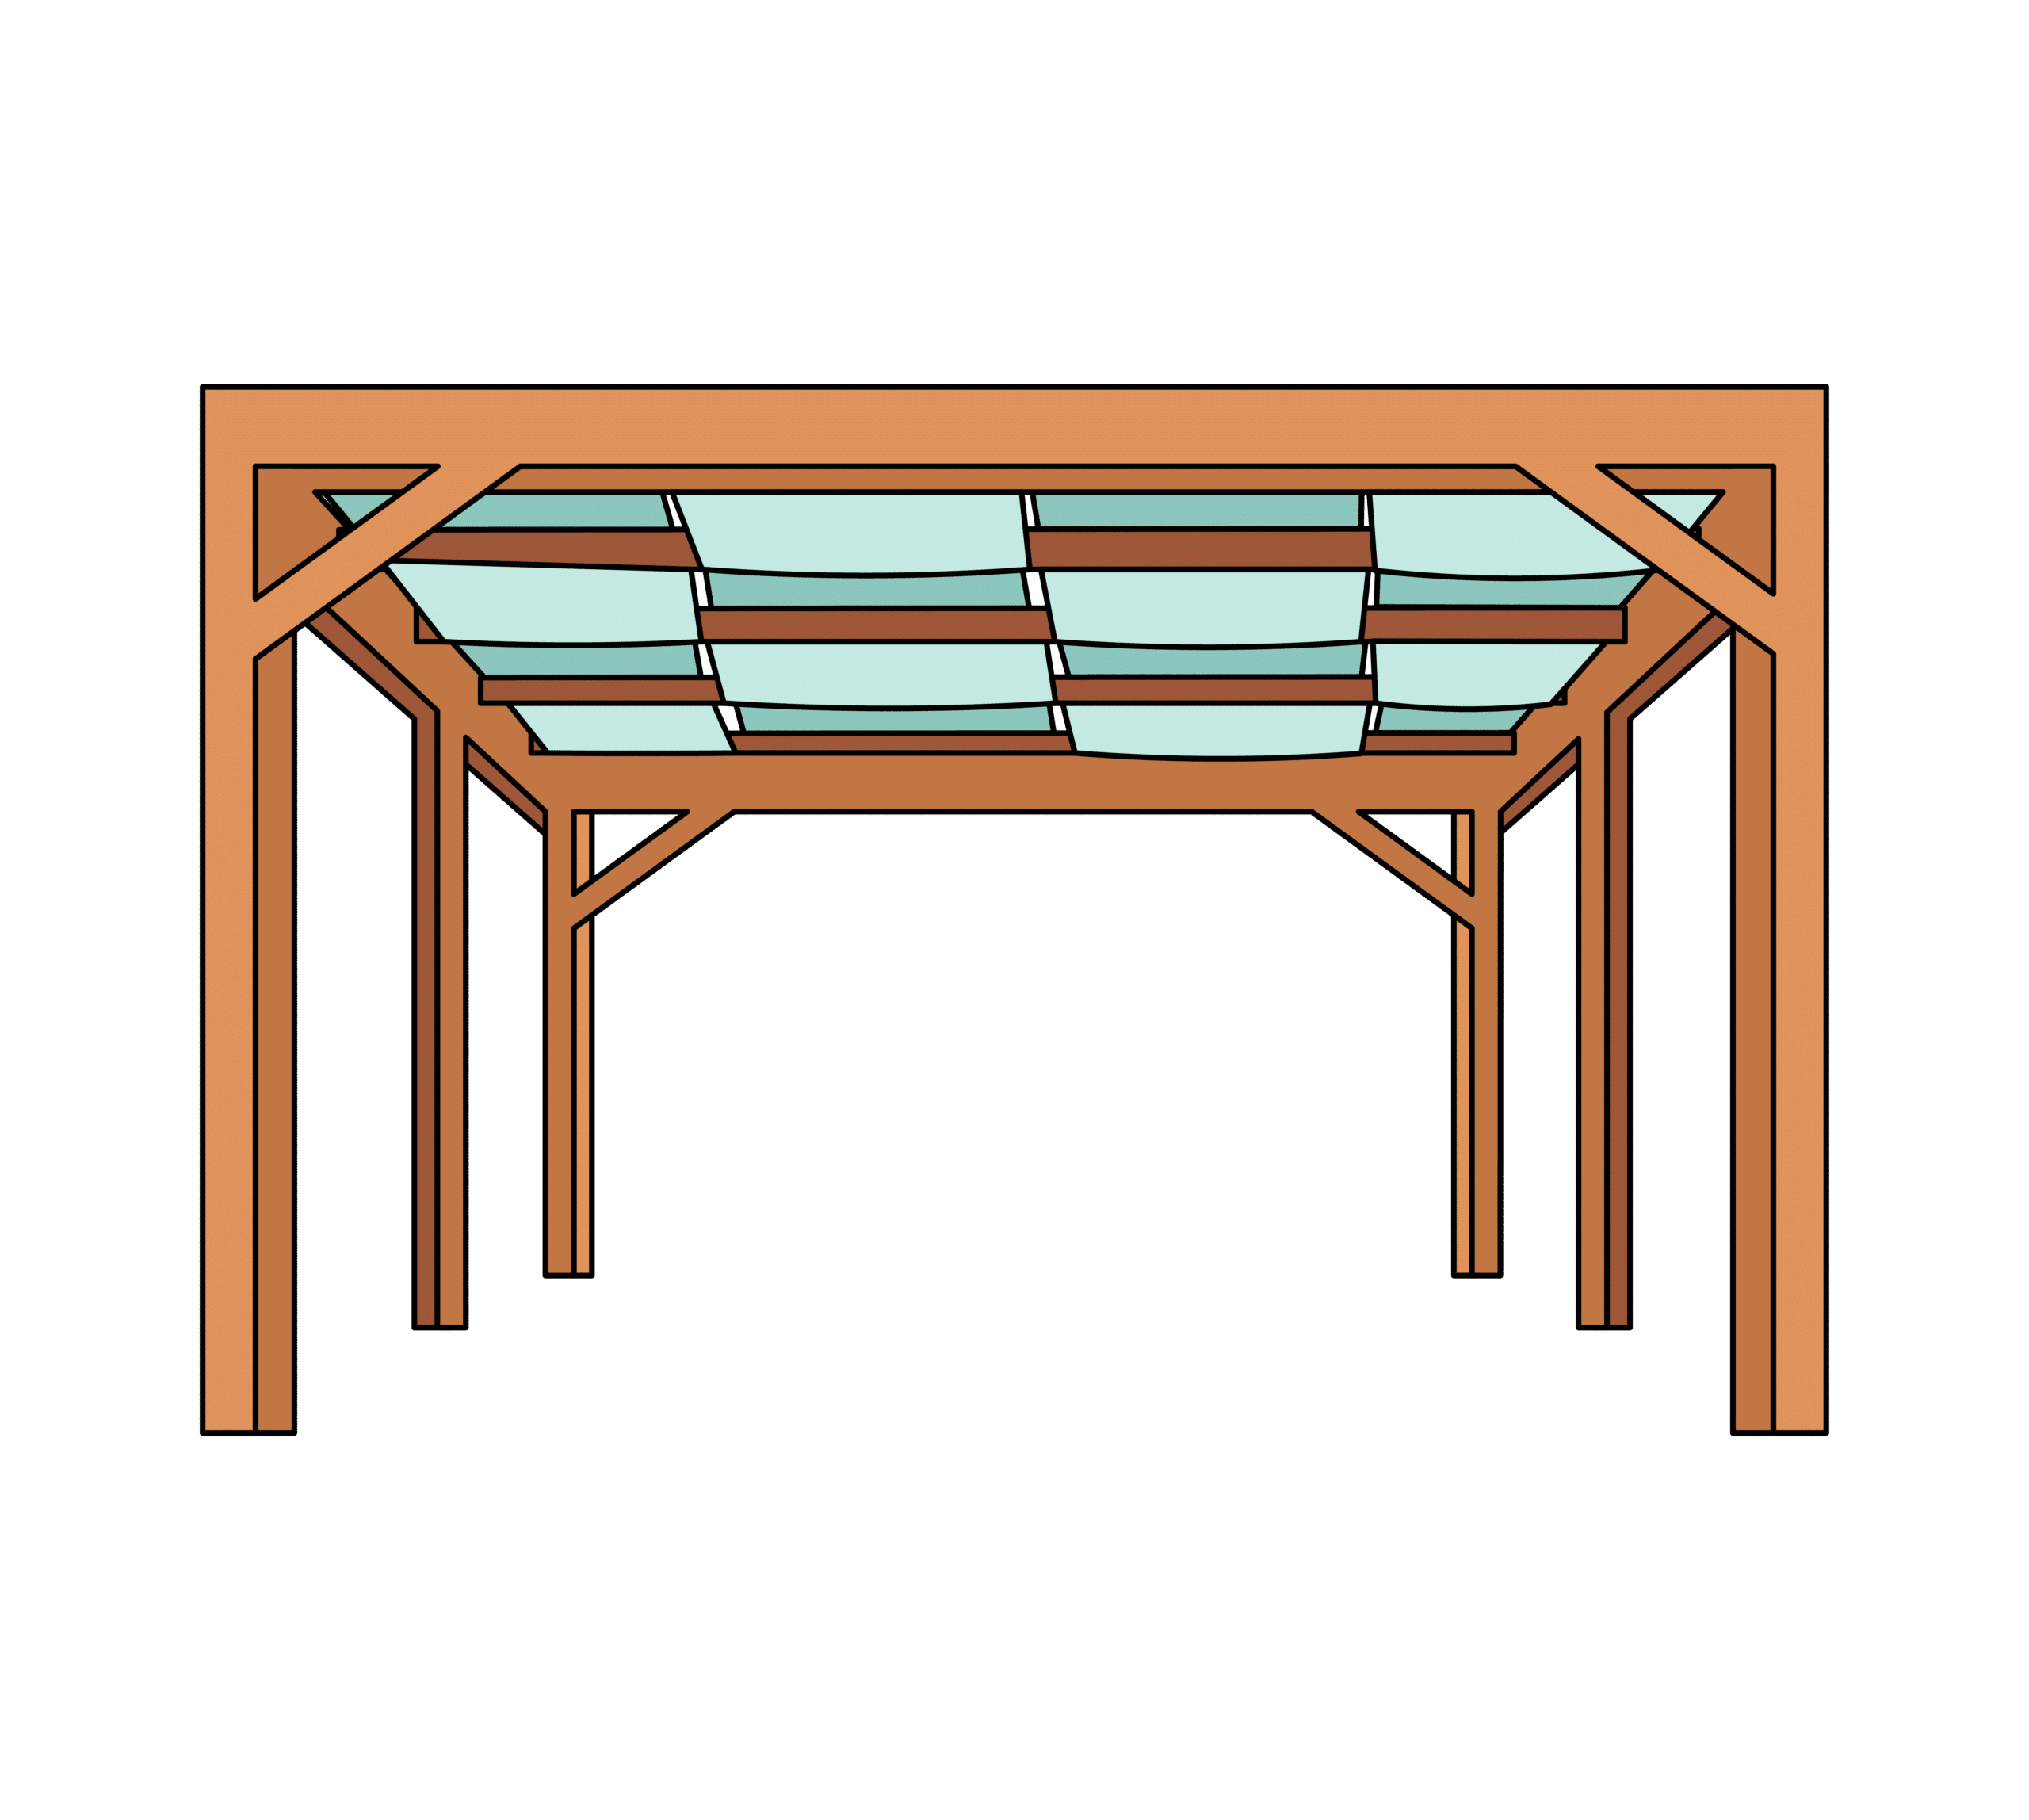 Cloth roof pergola illustration